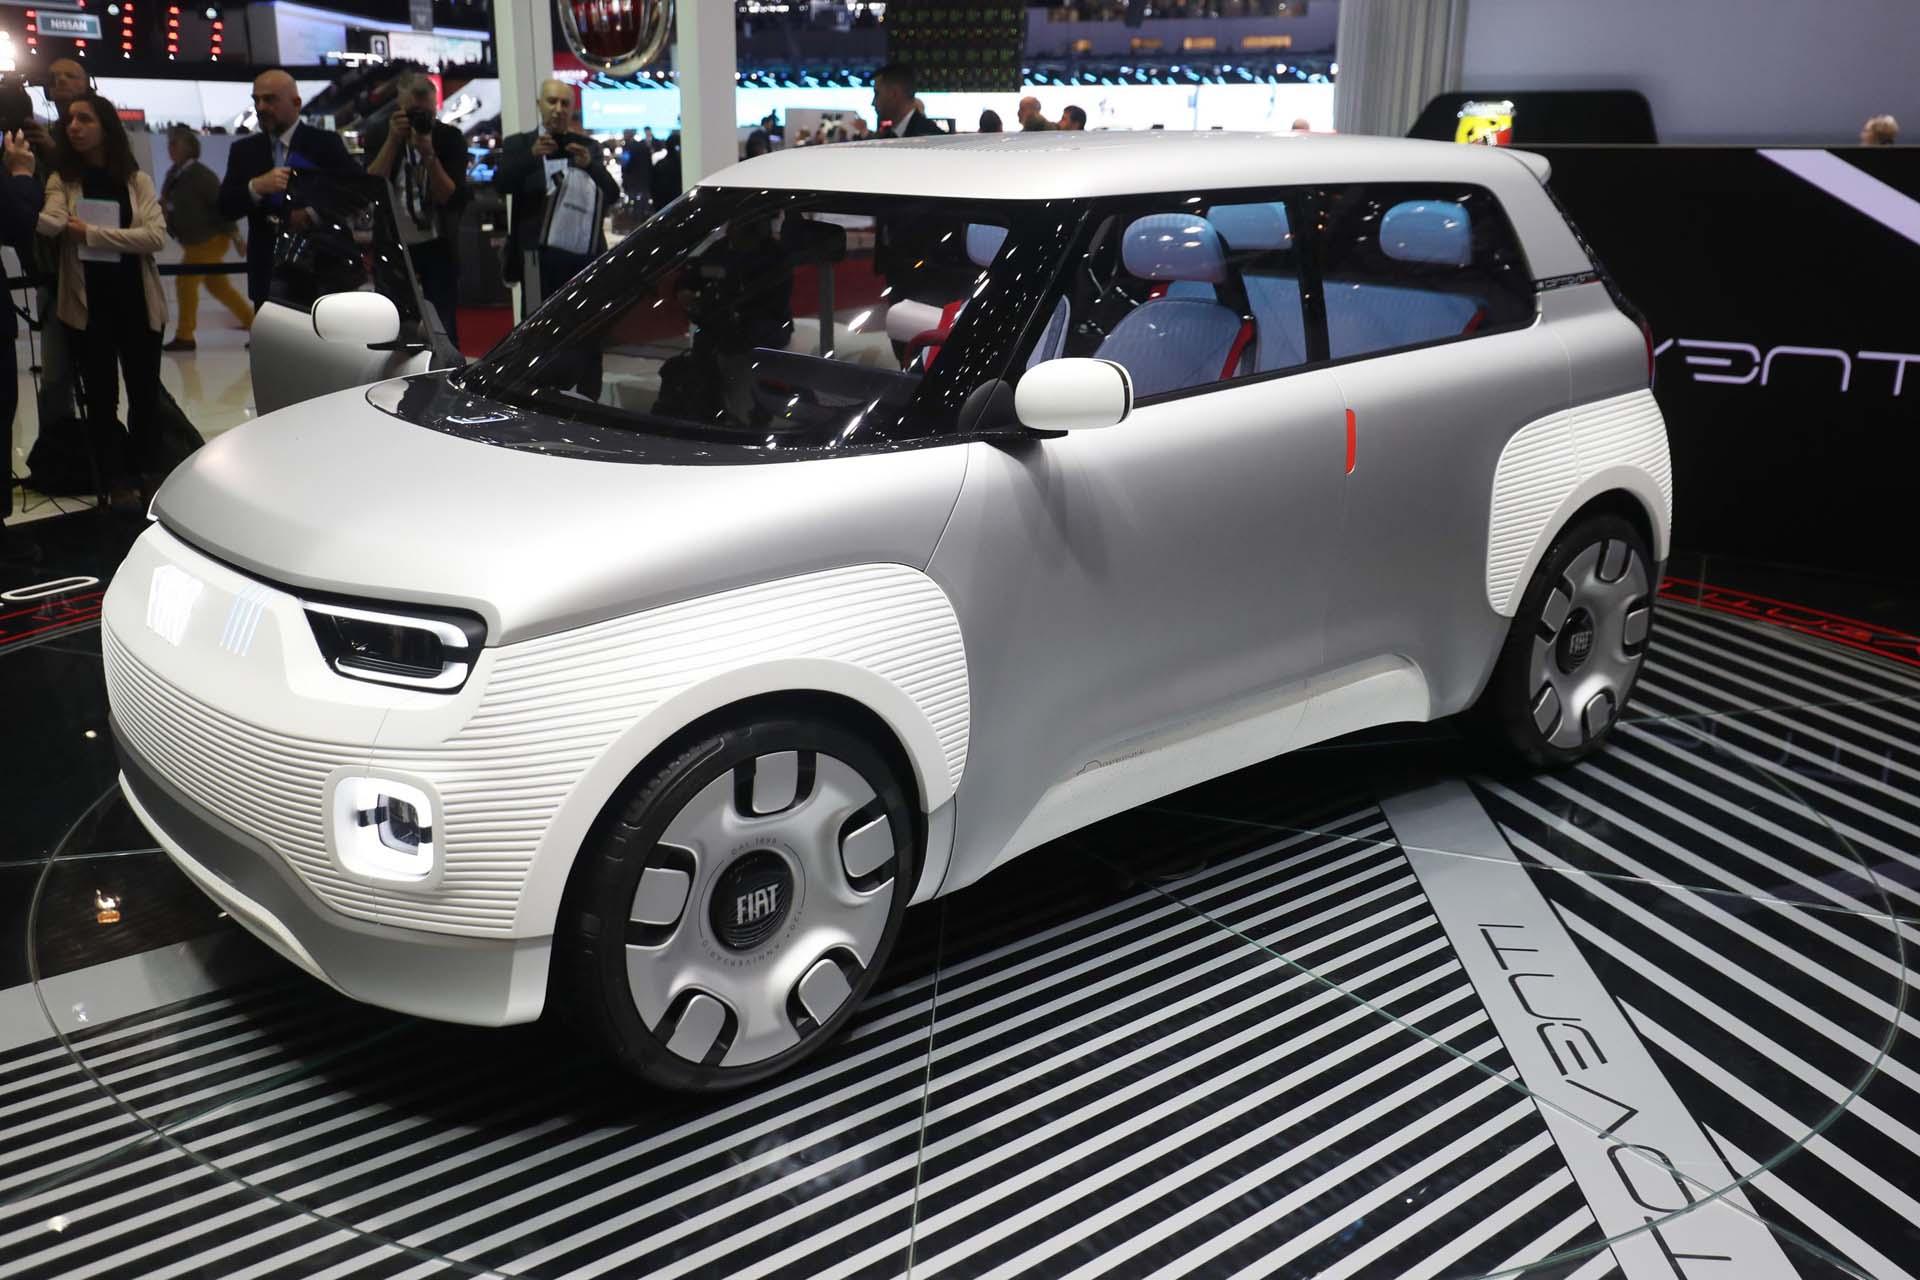 Fiat Electric Car >> Fiat Concept Centoventi Electric Car Opens Mopar Toolbox Looks